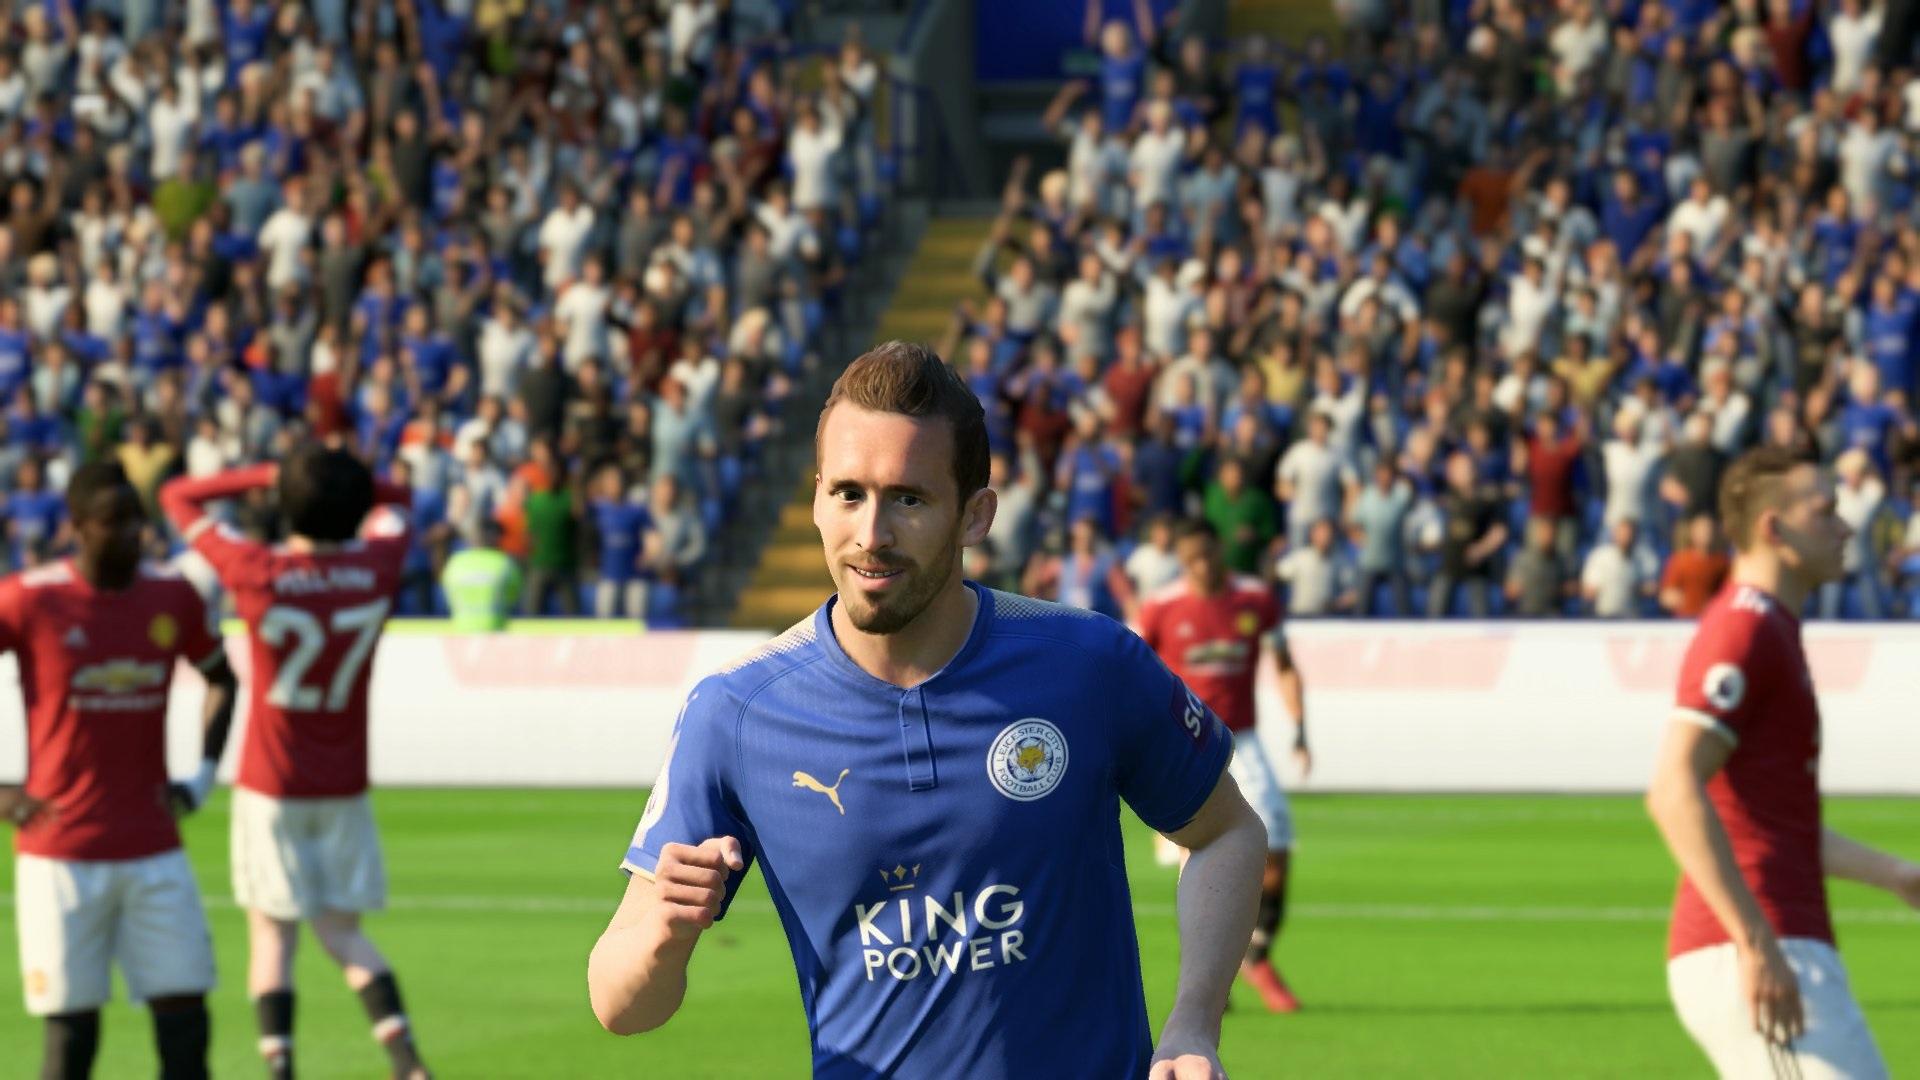 Christian Fuchs Leicester FIFA 18 screengrab